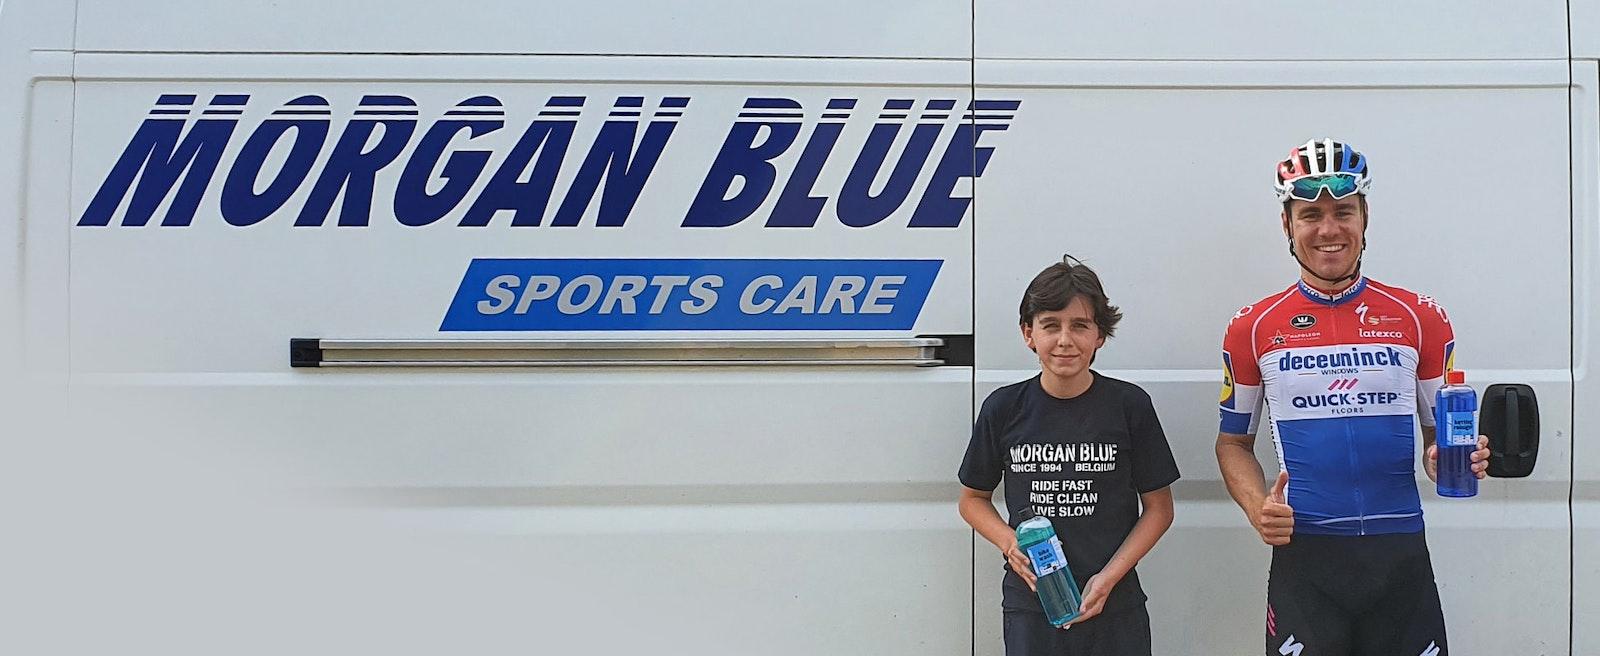 JOIN MRGAN BLUE